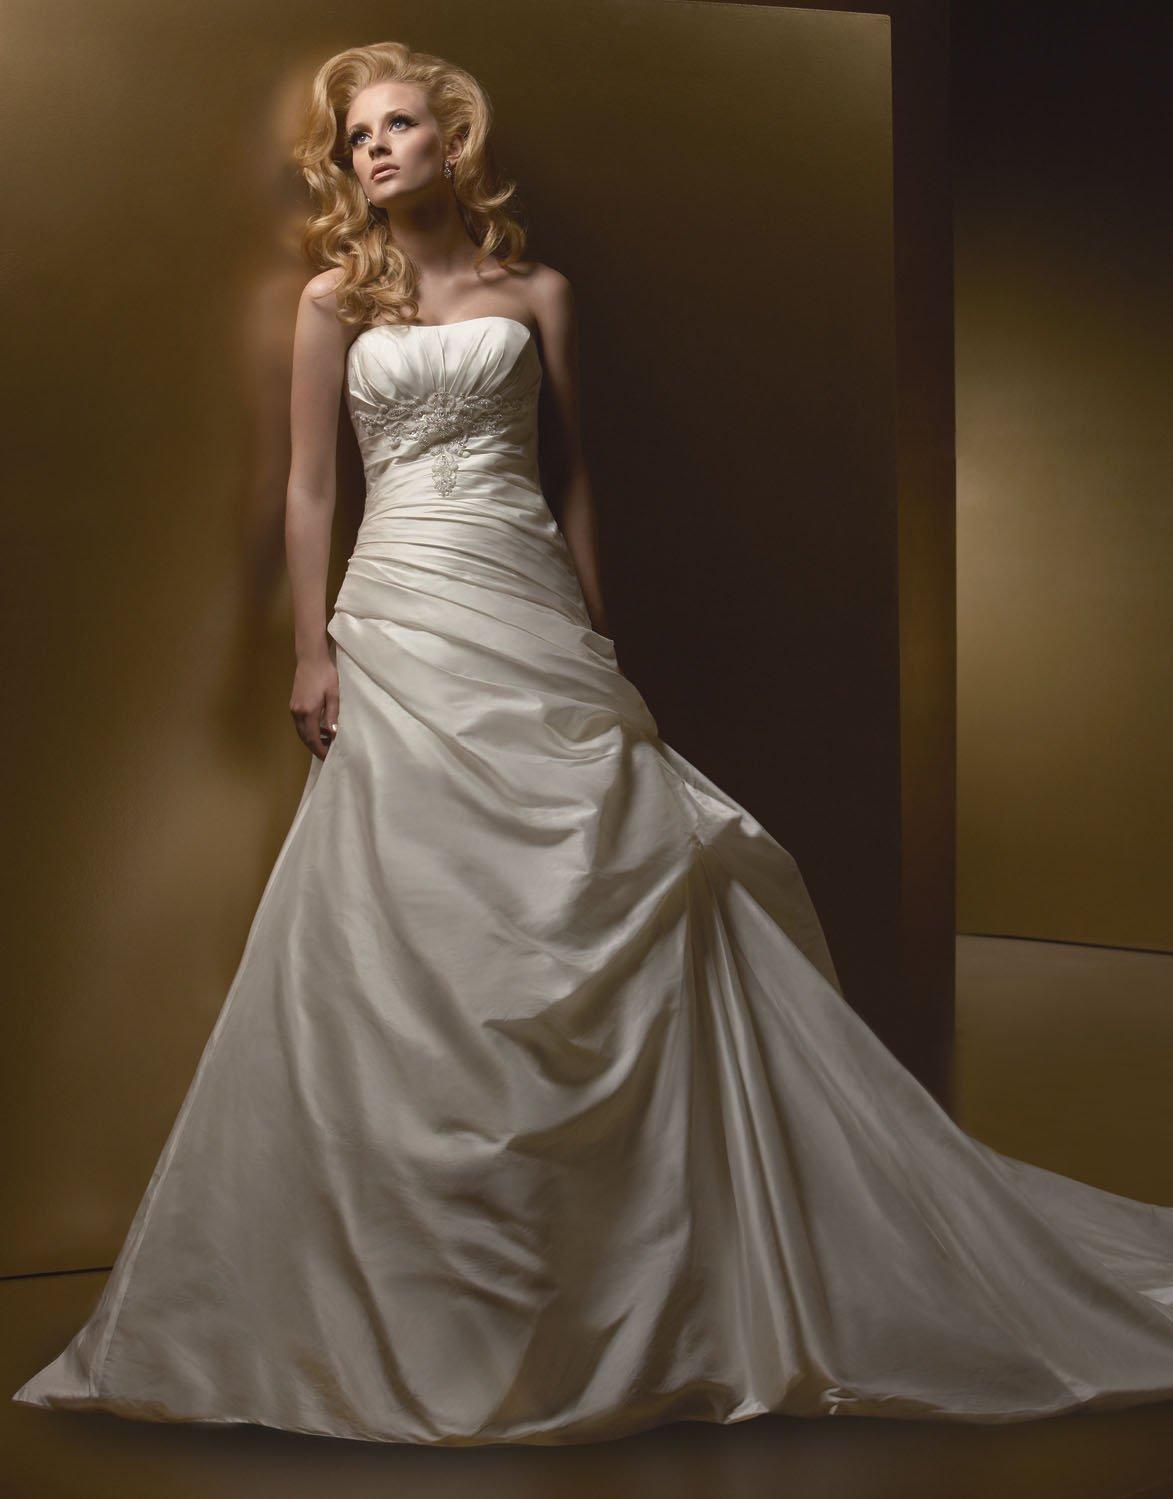 A-line Scoop Neckline Appliques Taffeta Wedding Dress Bridal Gown aq0031